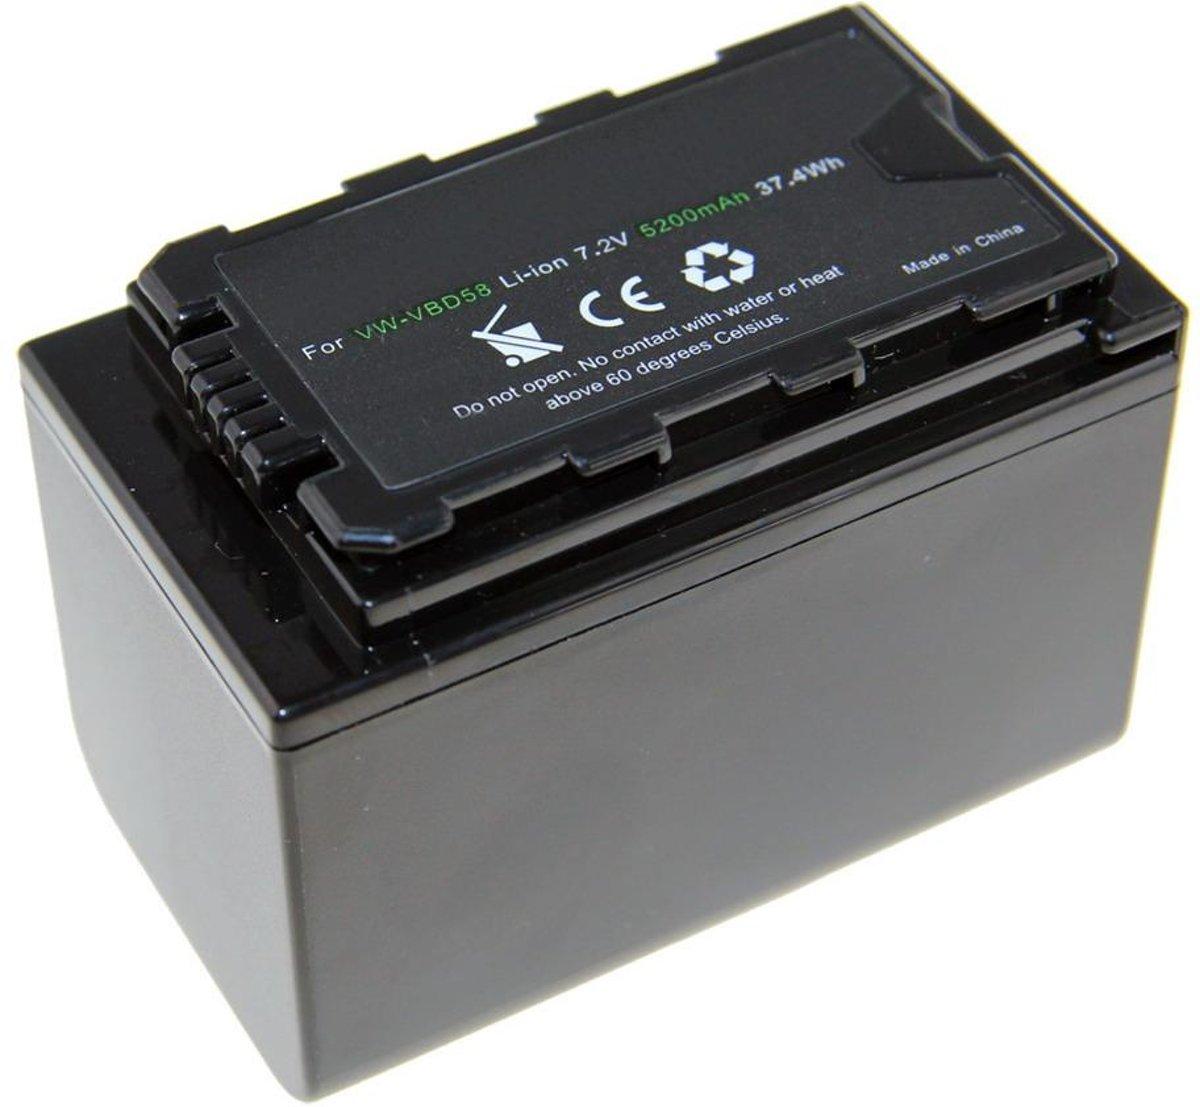 Huismerk Camera-accu VW-VBD58 voor Panasonic